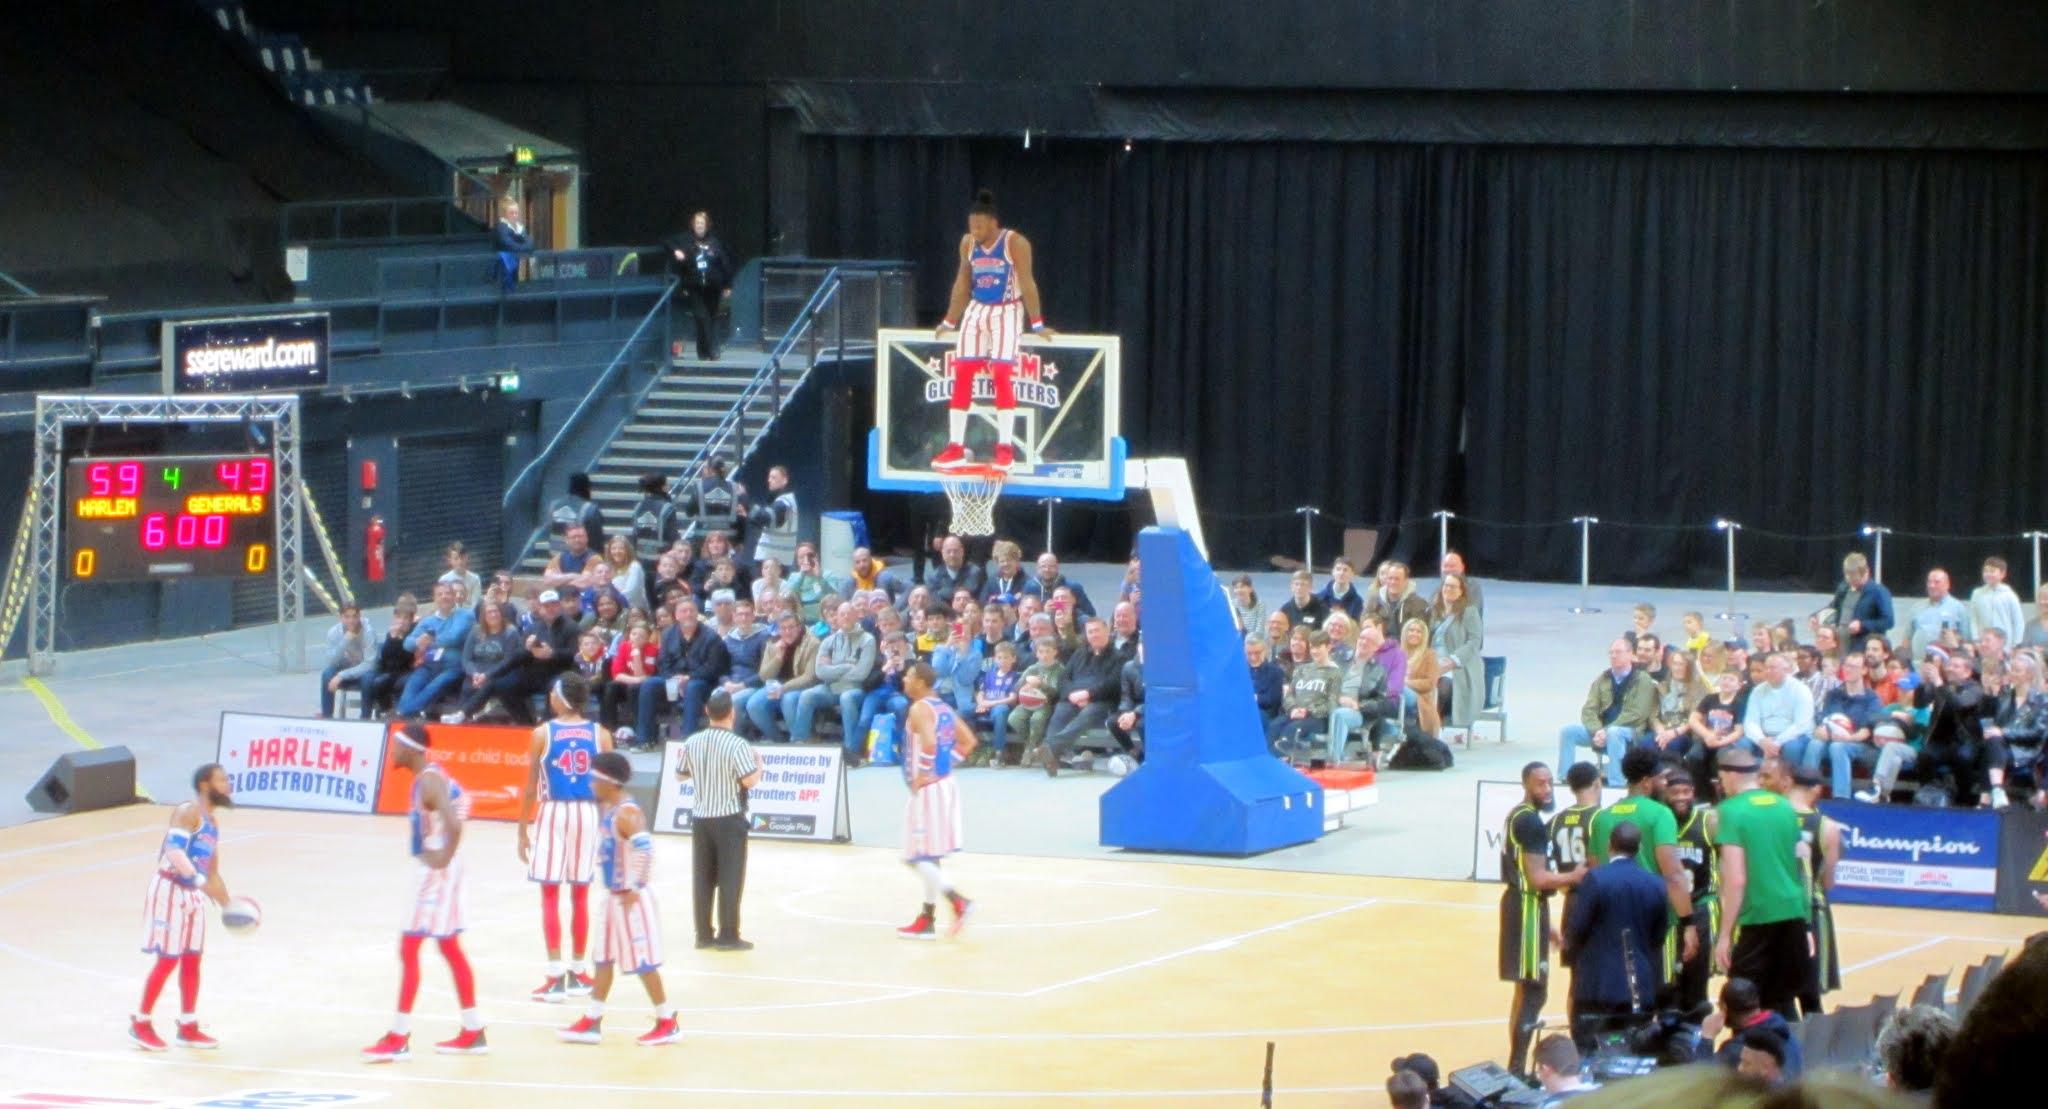 A Harlem Globetrotters player stands on the basket